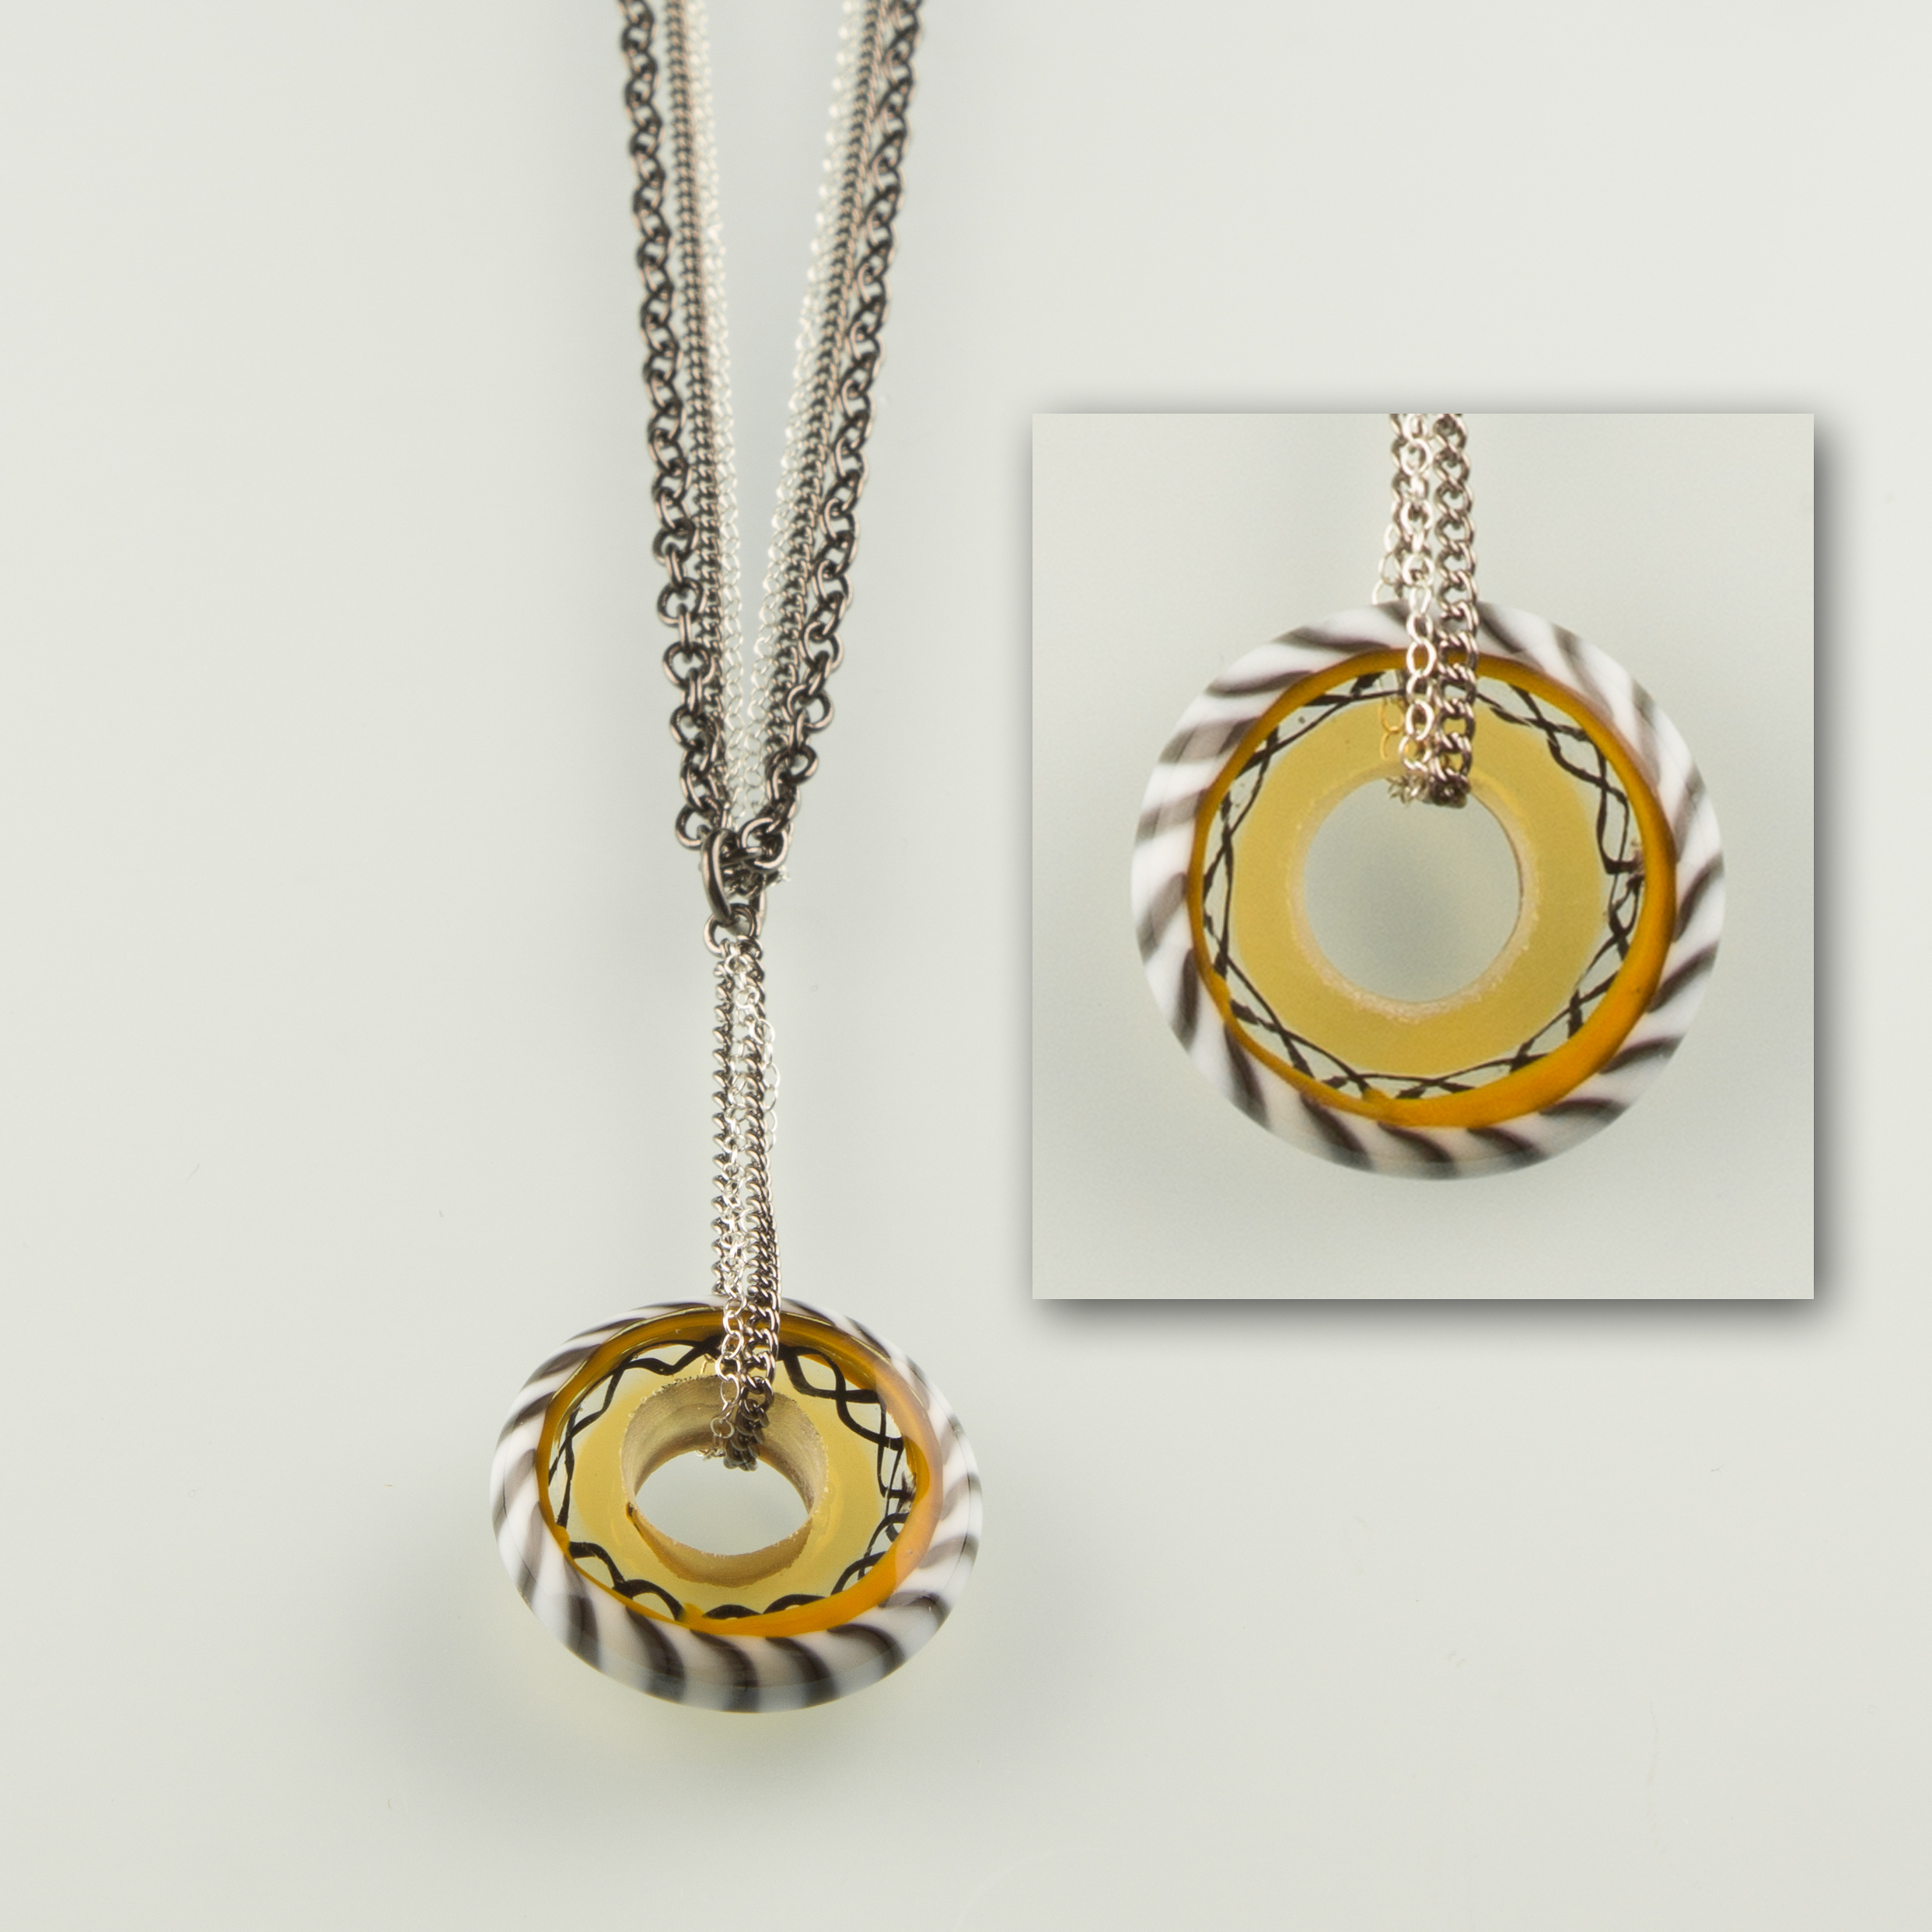 Hand made glass disc beads